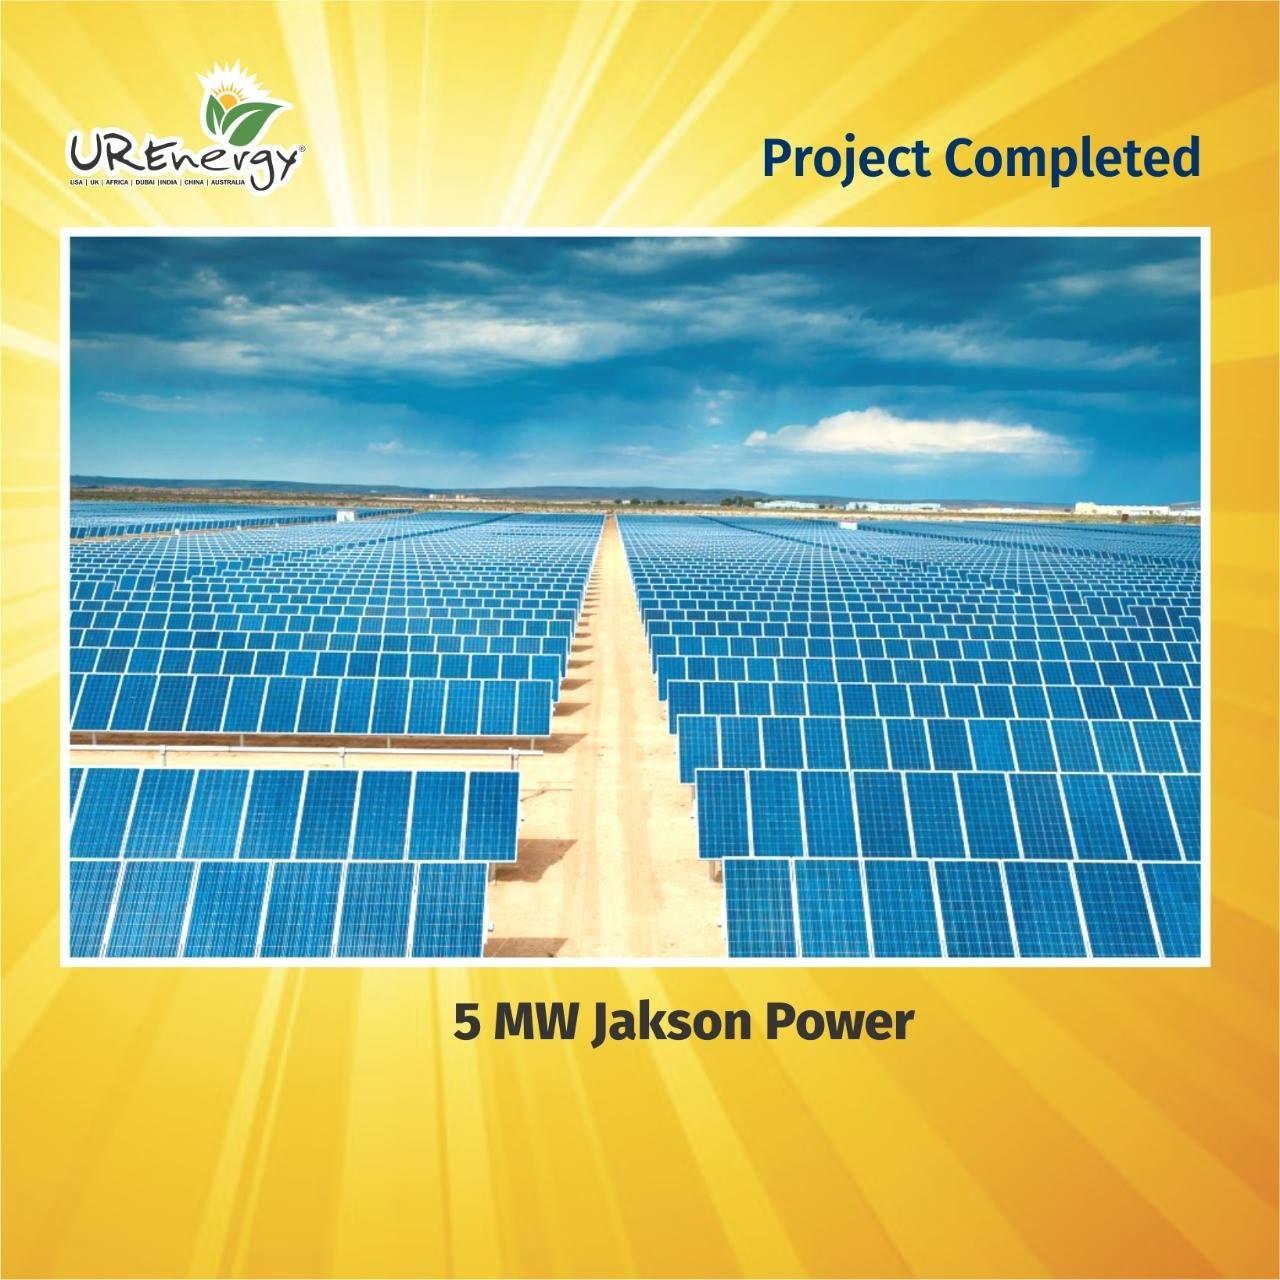 Solar Power Panel Inverters Irrigation Pumps Street Light Epc Solar Panels Solar Photovoltaic Cells